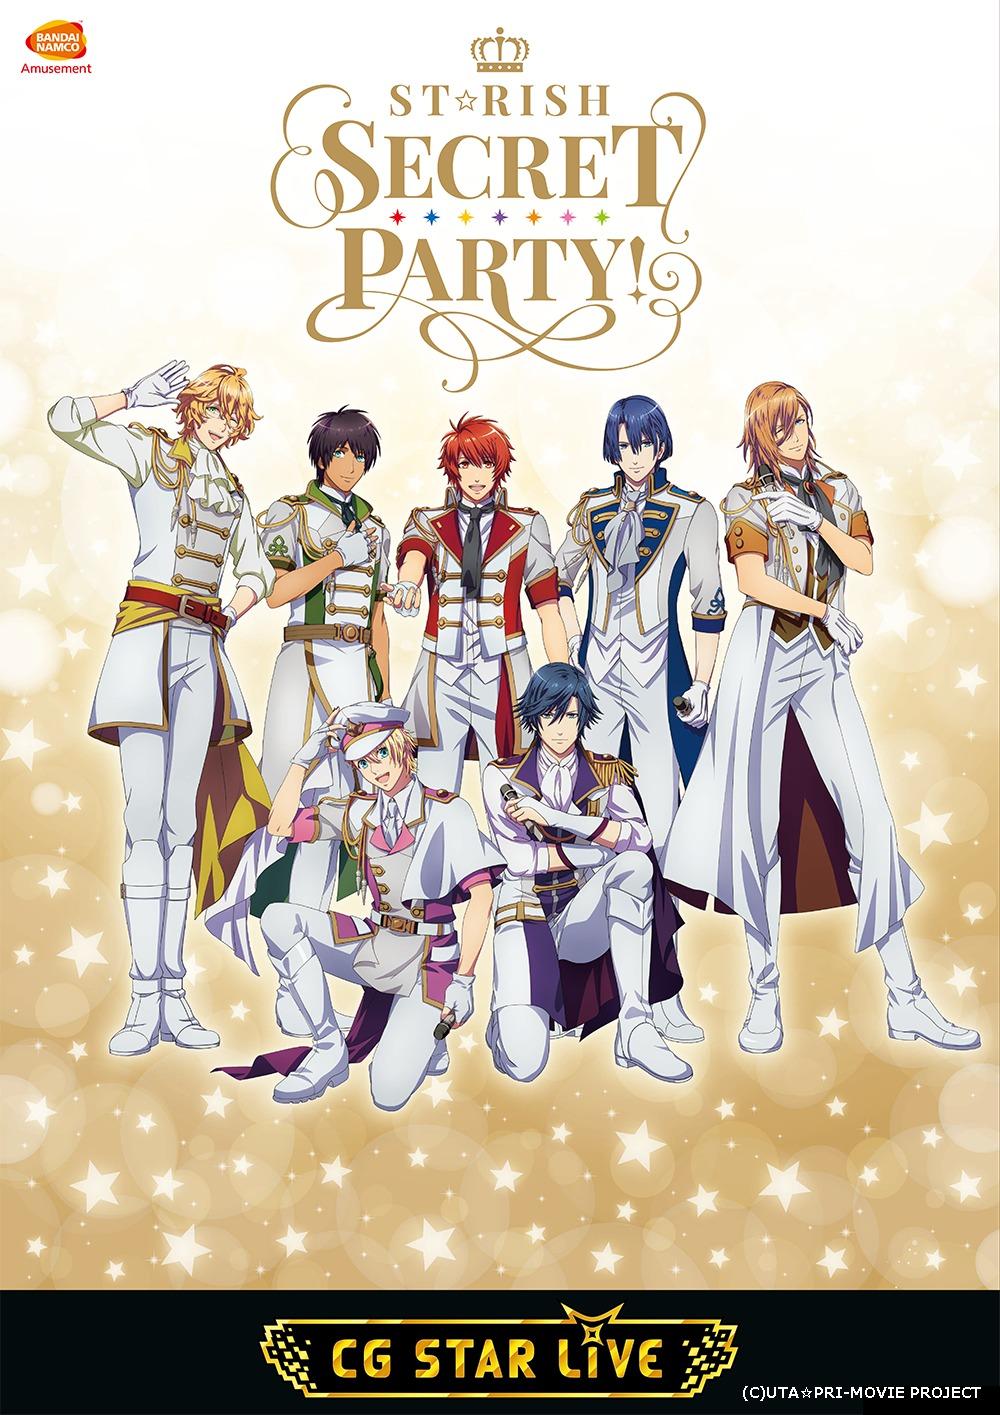 『ST☆RISH SECRET PARTY!』ビジュアル (C)UTA☆PRI-MOVIE PROJECT